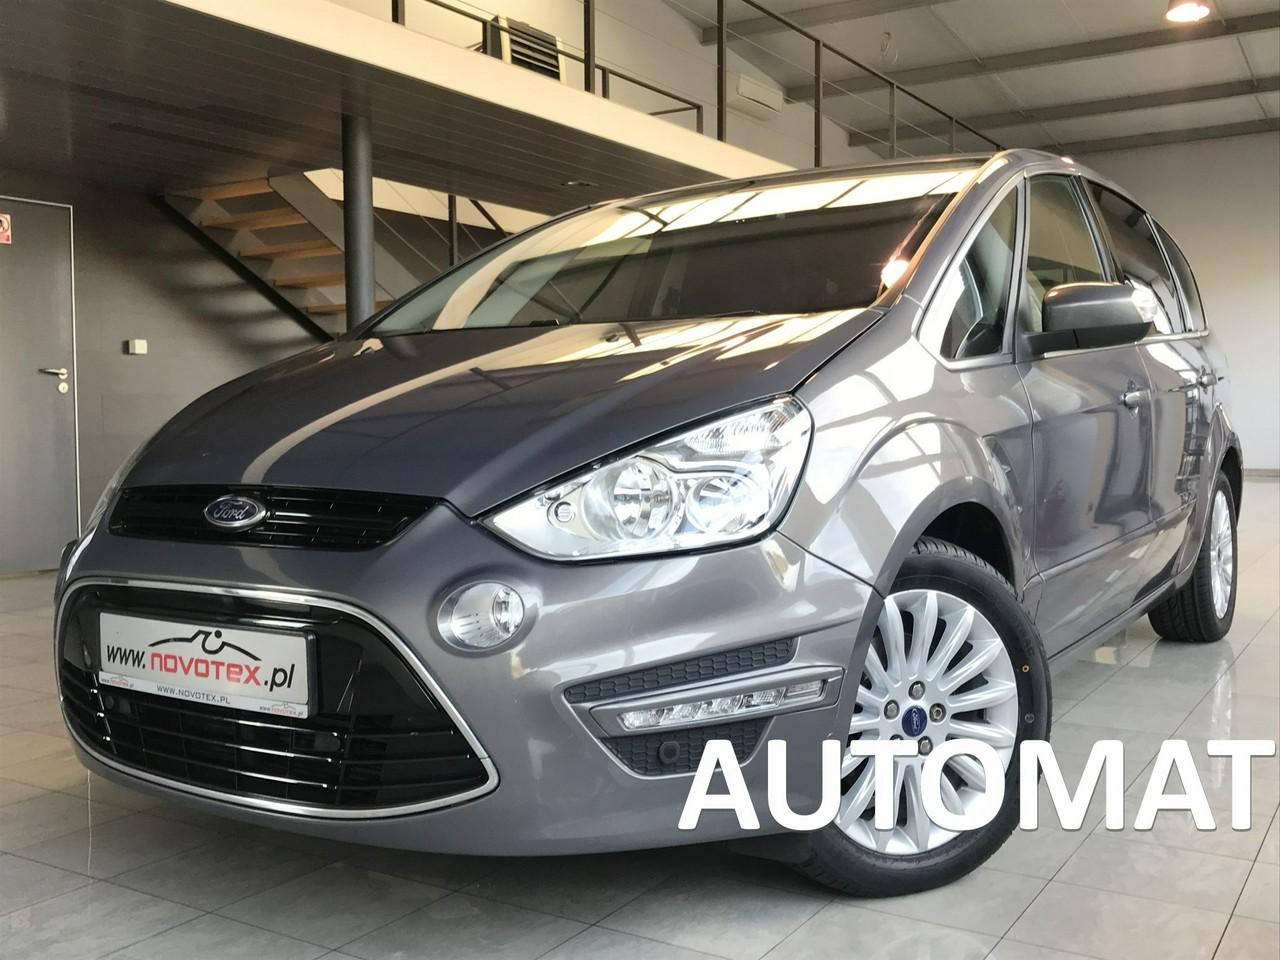 Ford S-Max 2.0TDCi*Titanium*automat*ALU*skóra*Convers+*navi*serwis ASO*Gwarancja